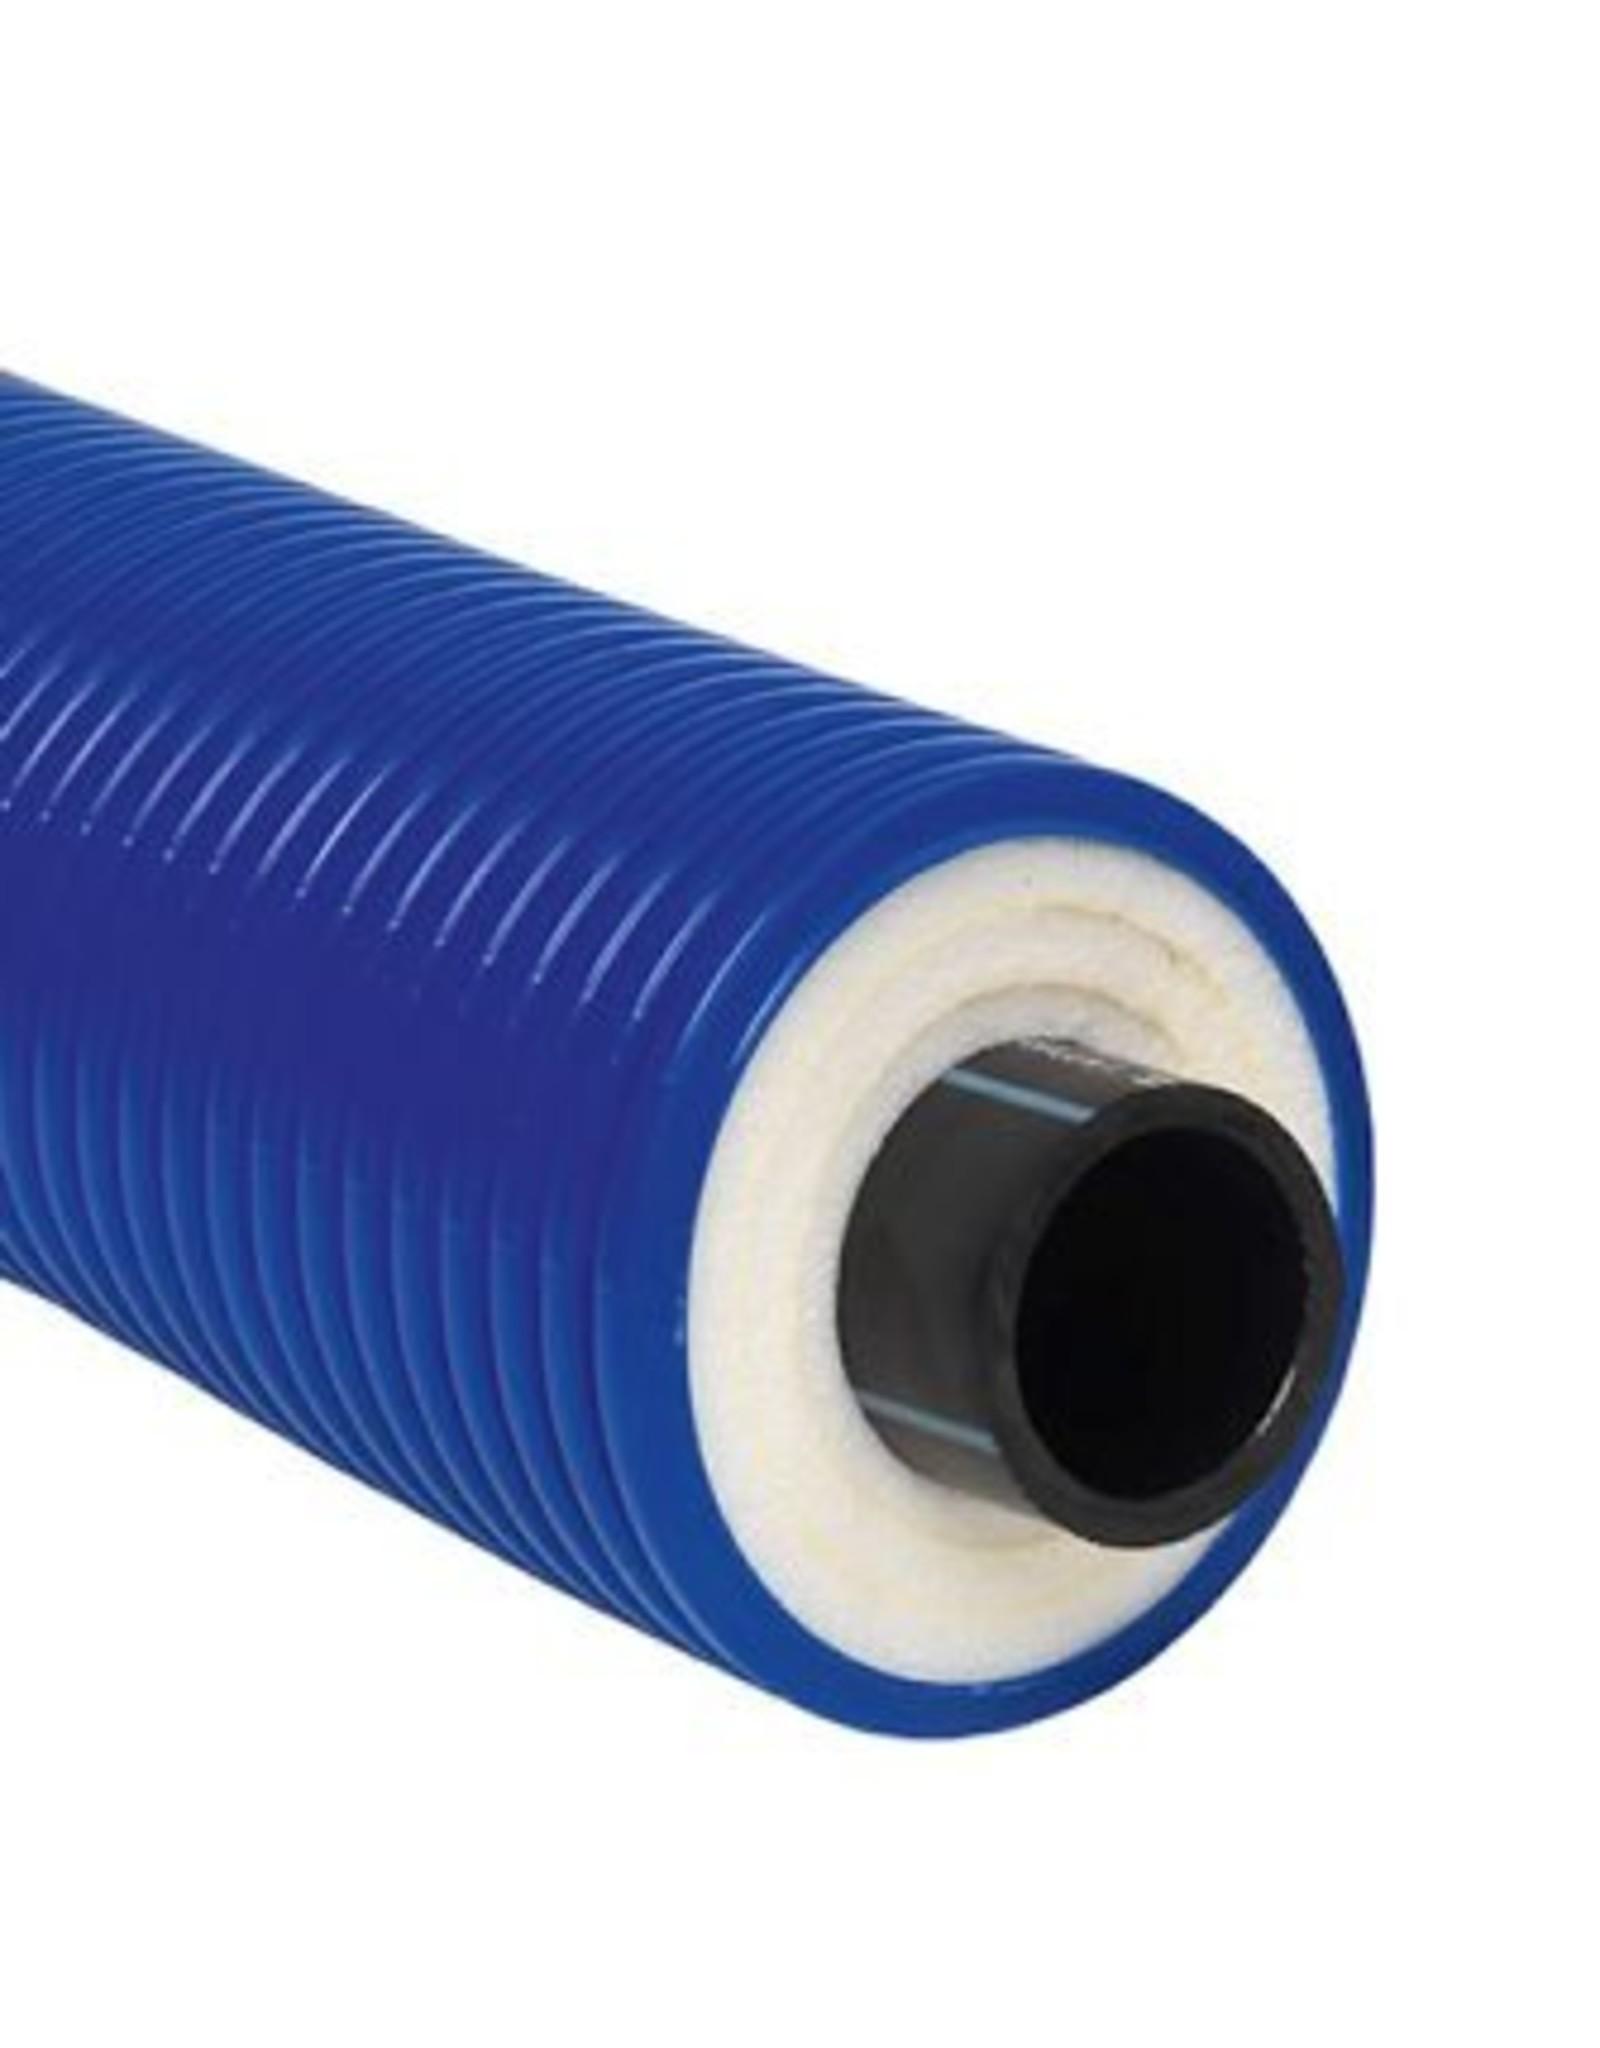 Microflex cool uno 90 x 8.2mm prijs per meter